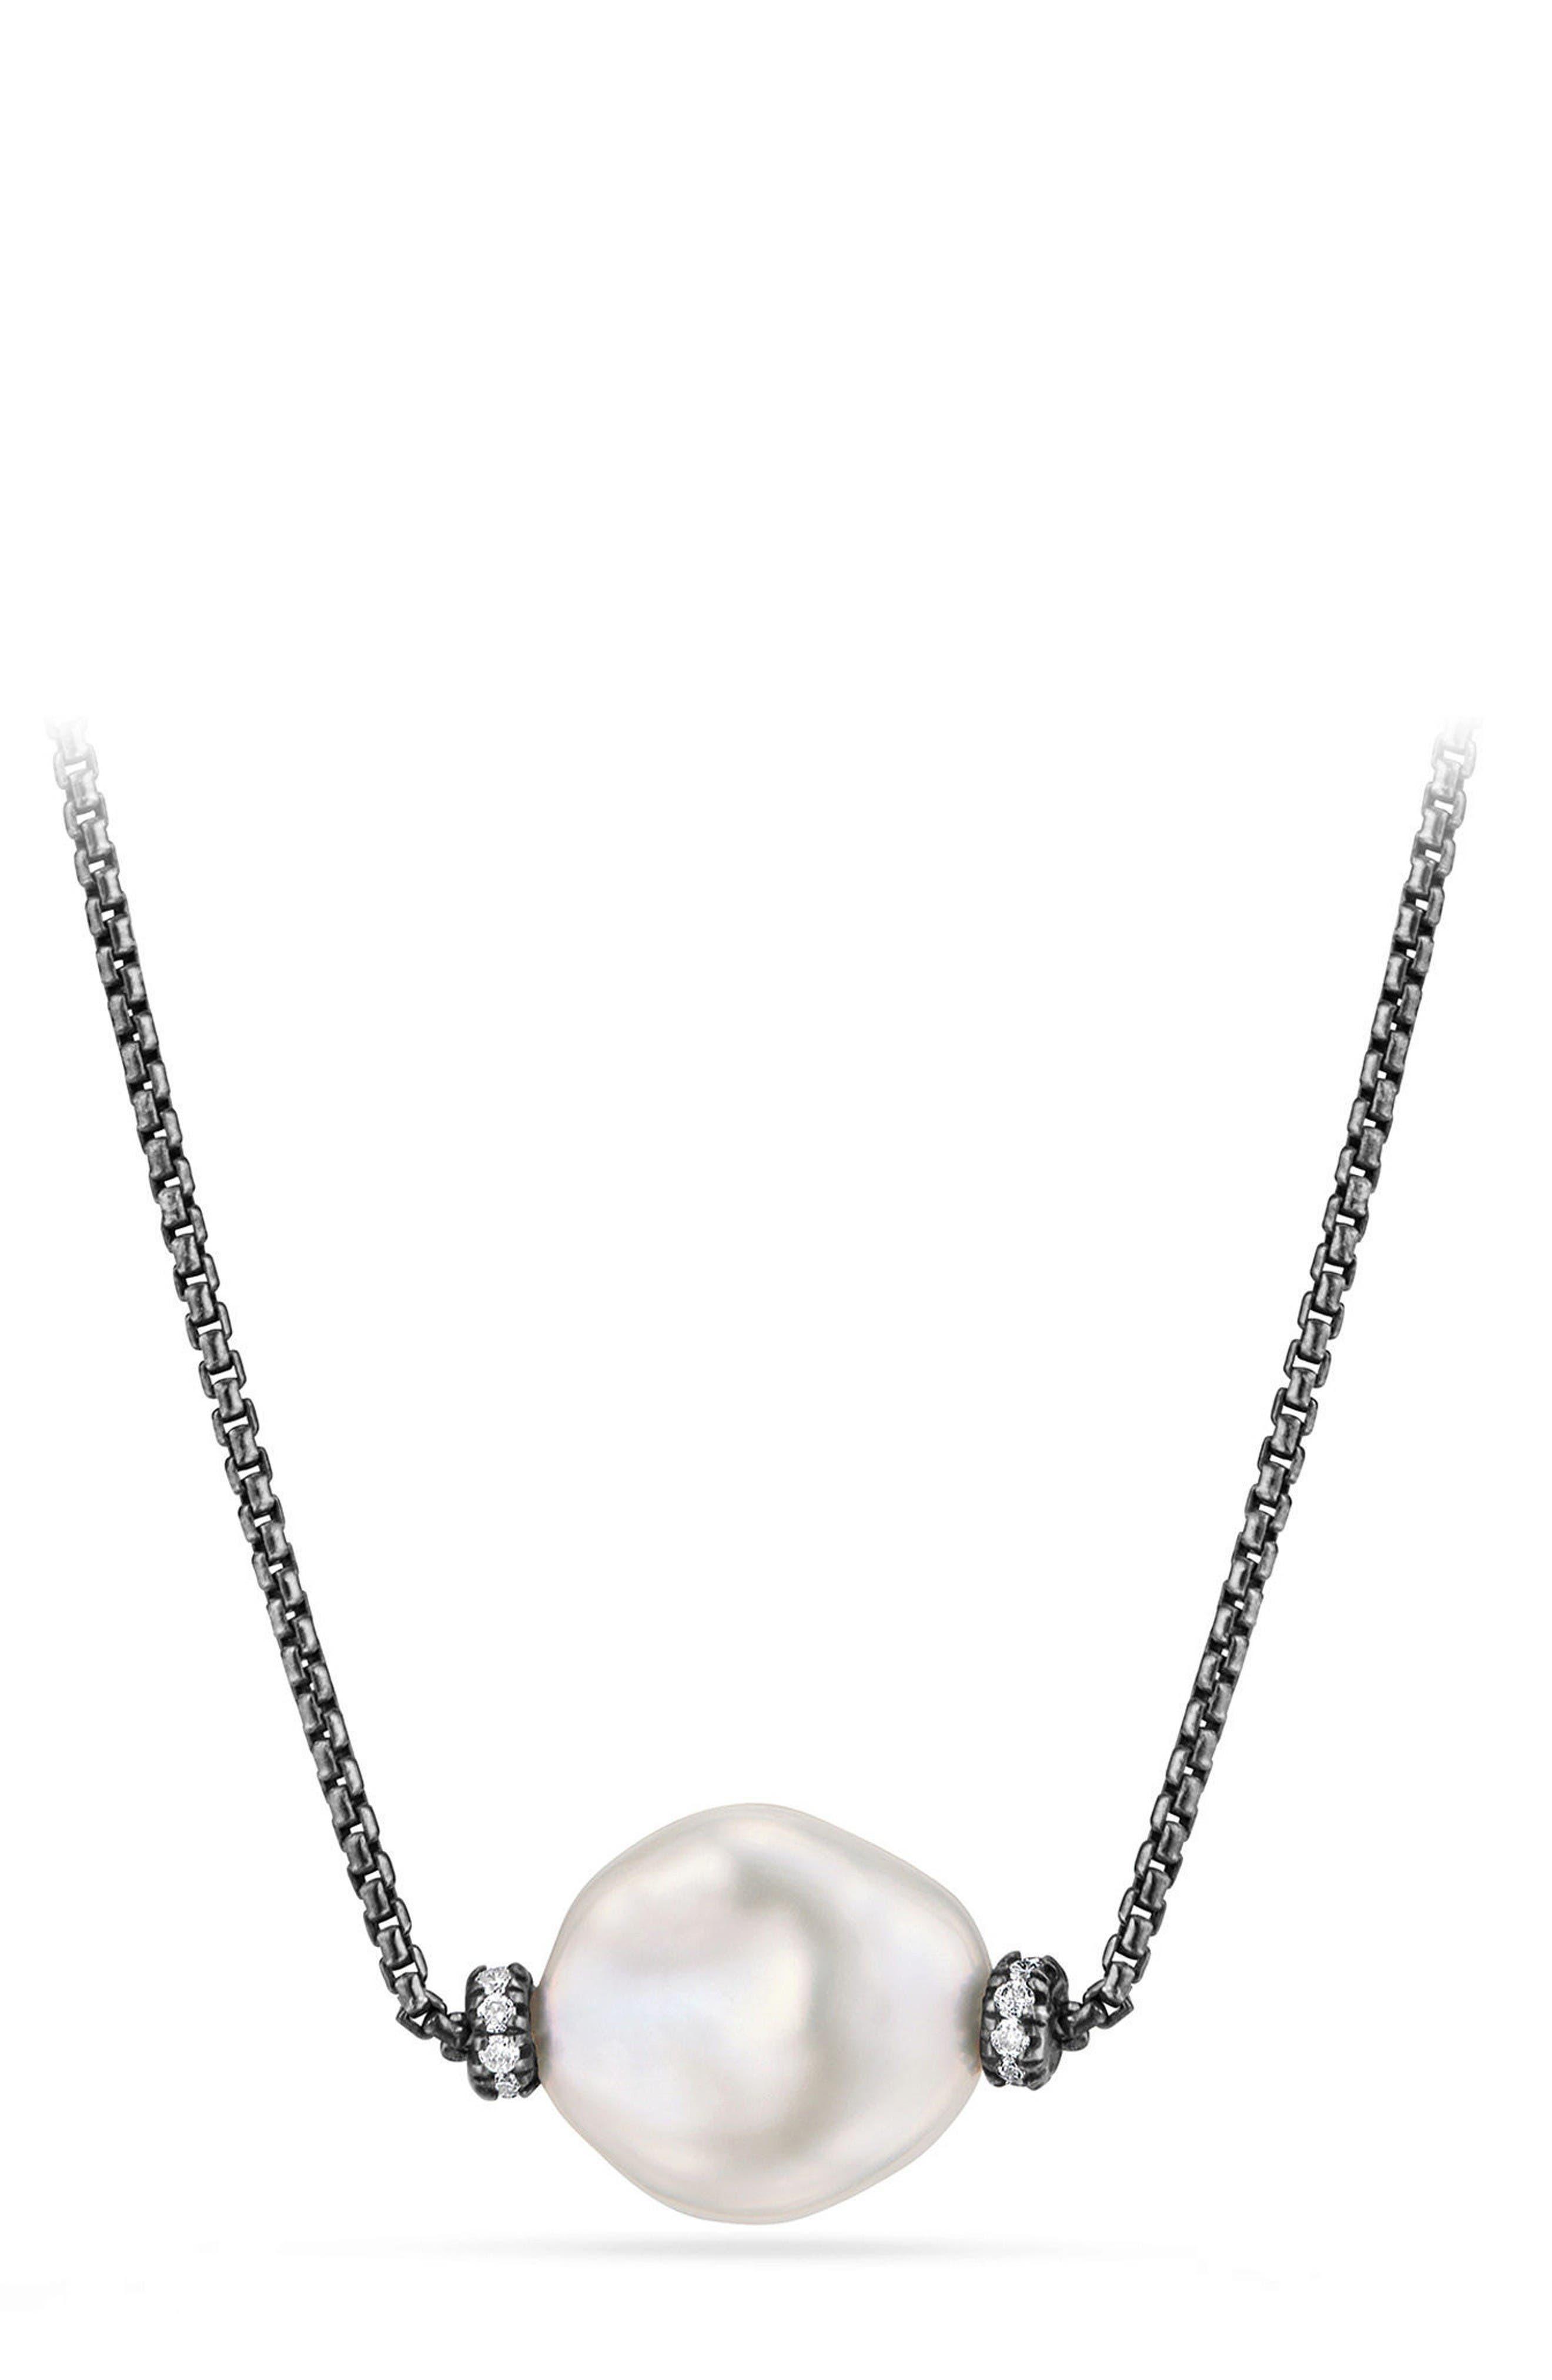 Alternate Image 1 Selected - David Yurman Solari Pearl & Diamond Station Necklace